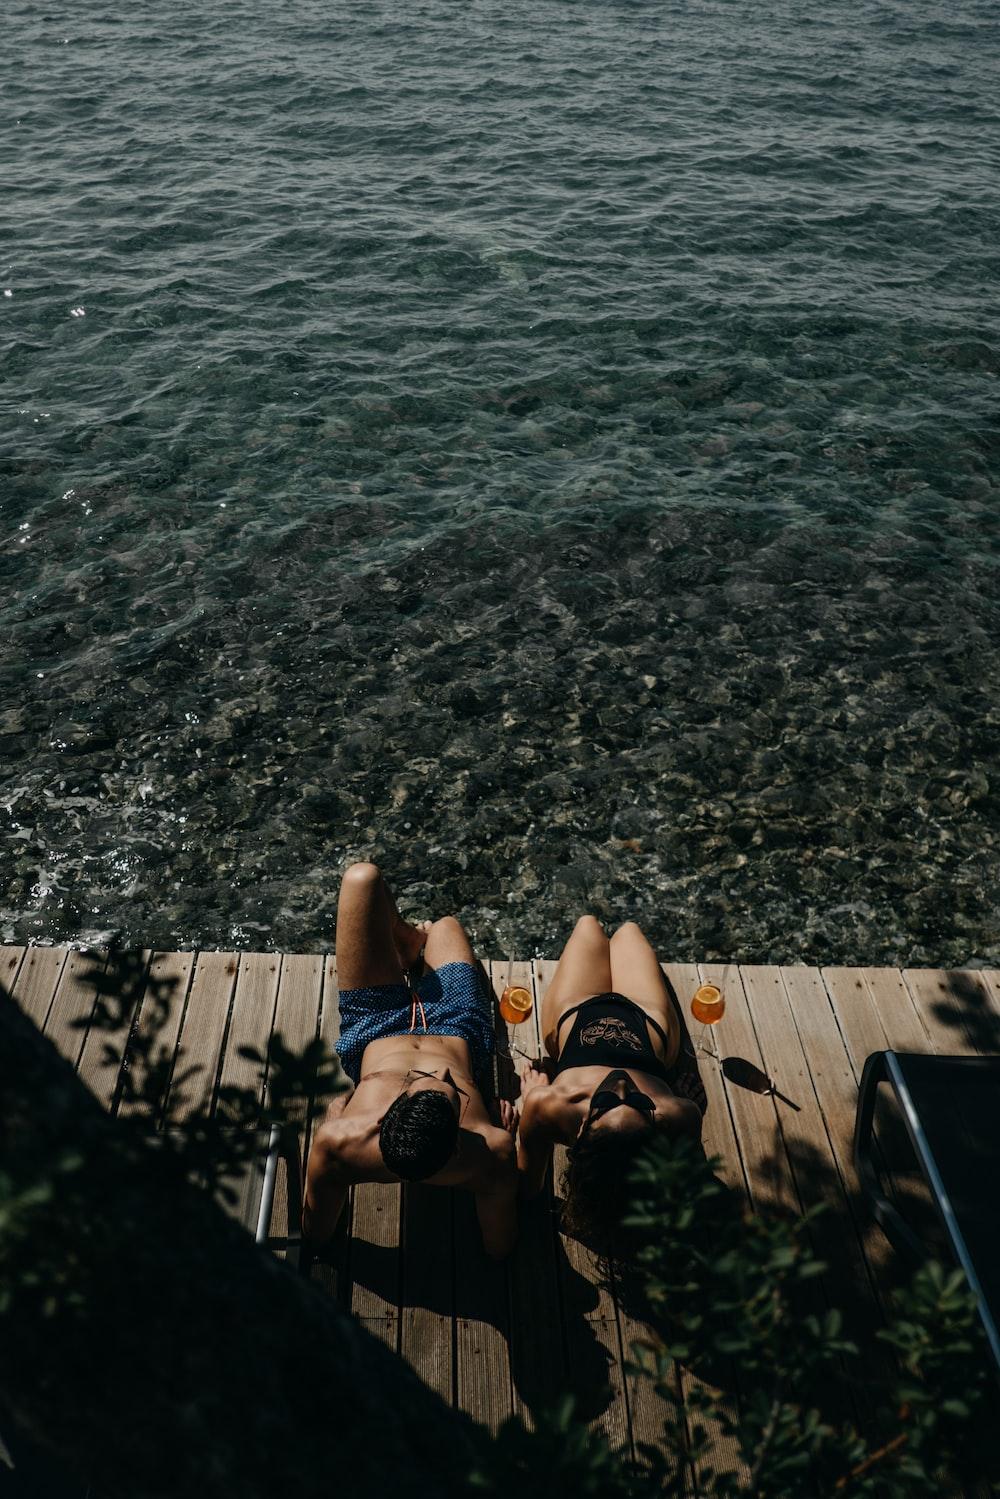 person in black flip flops sitting on wooden dock